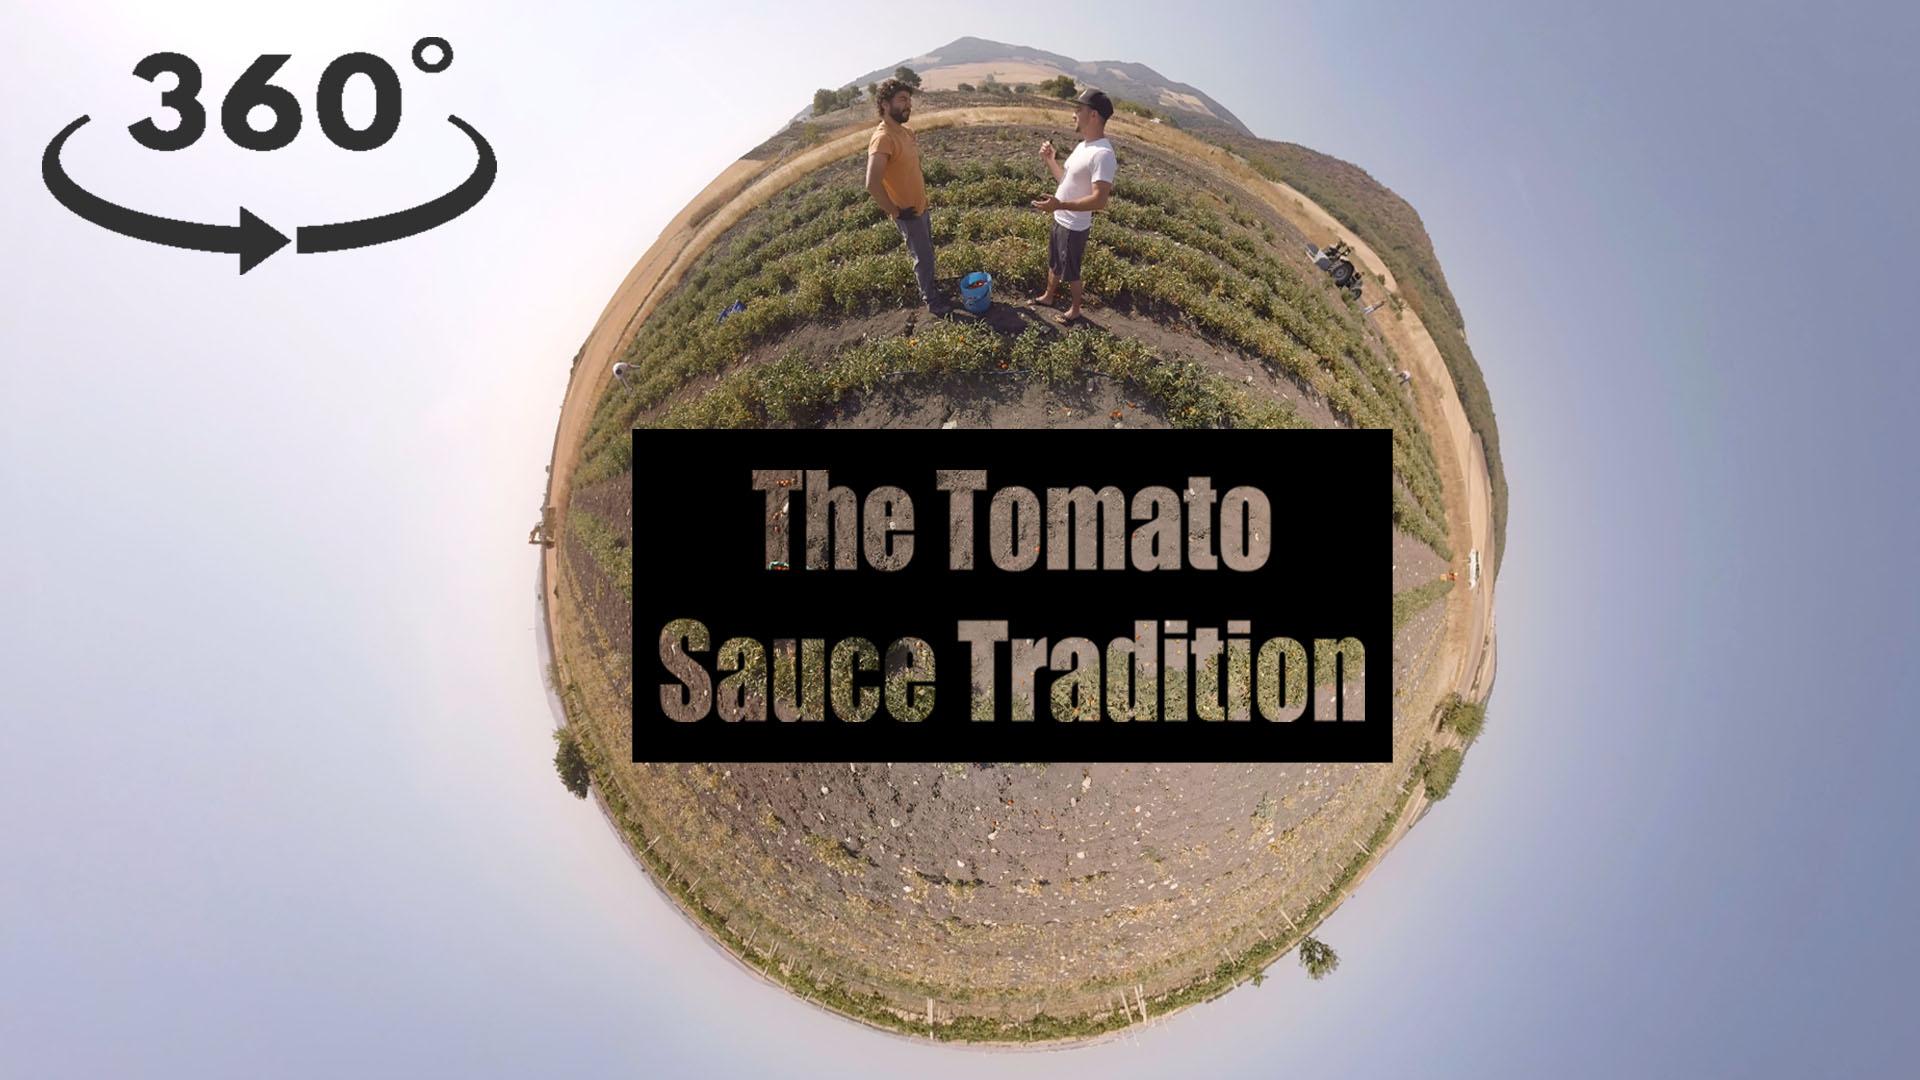 TomatoSauceTradition